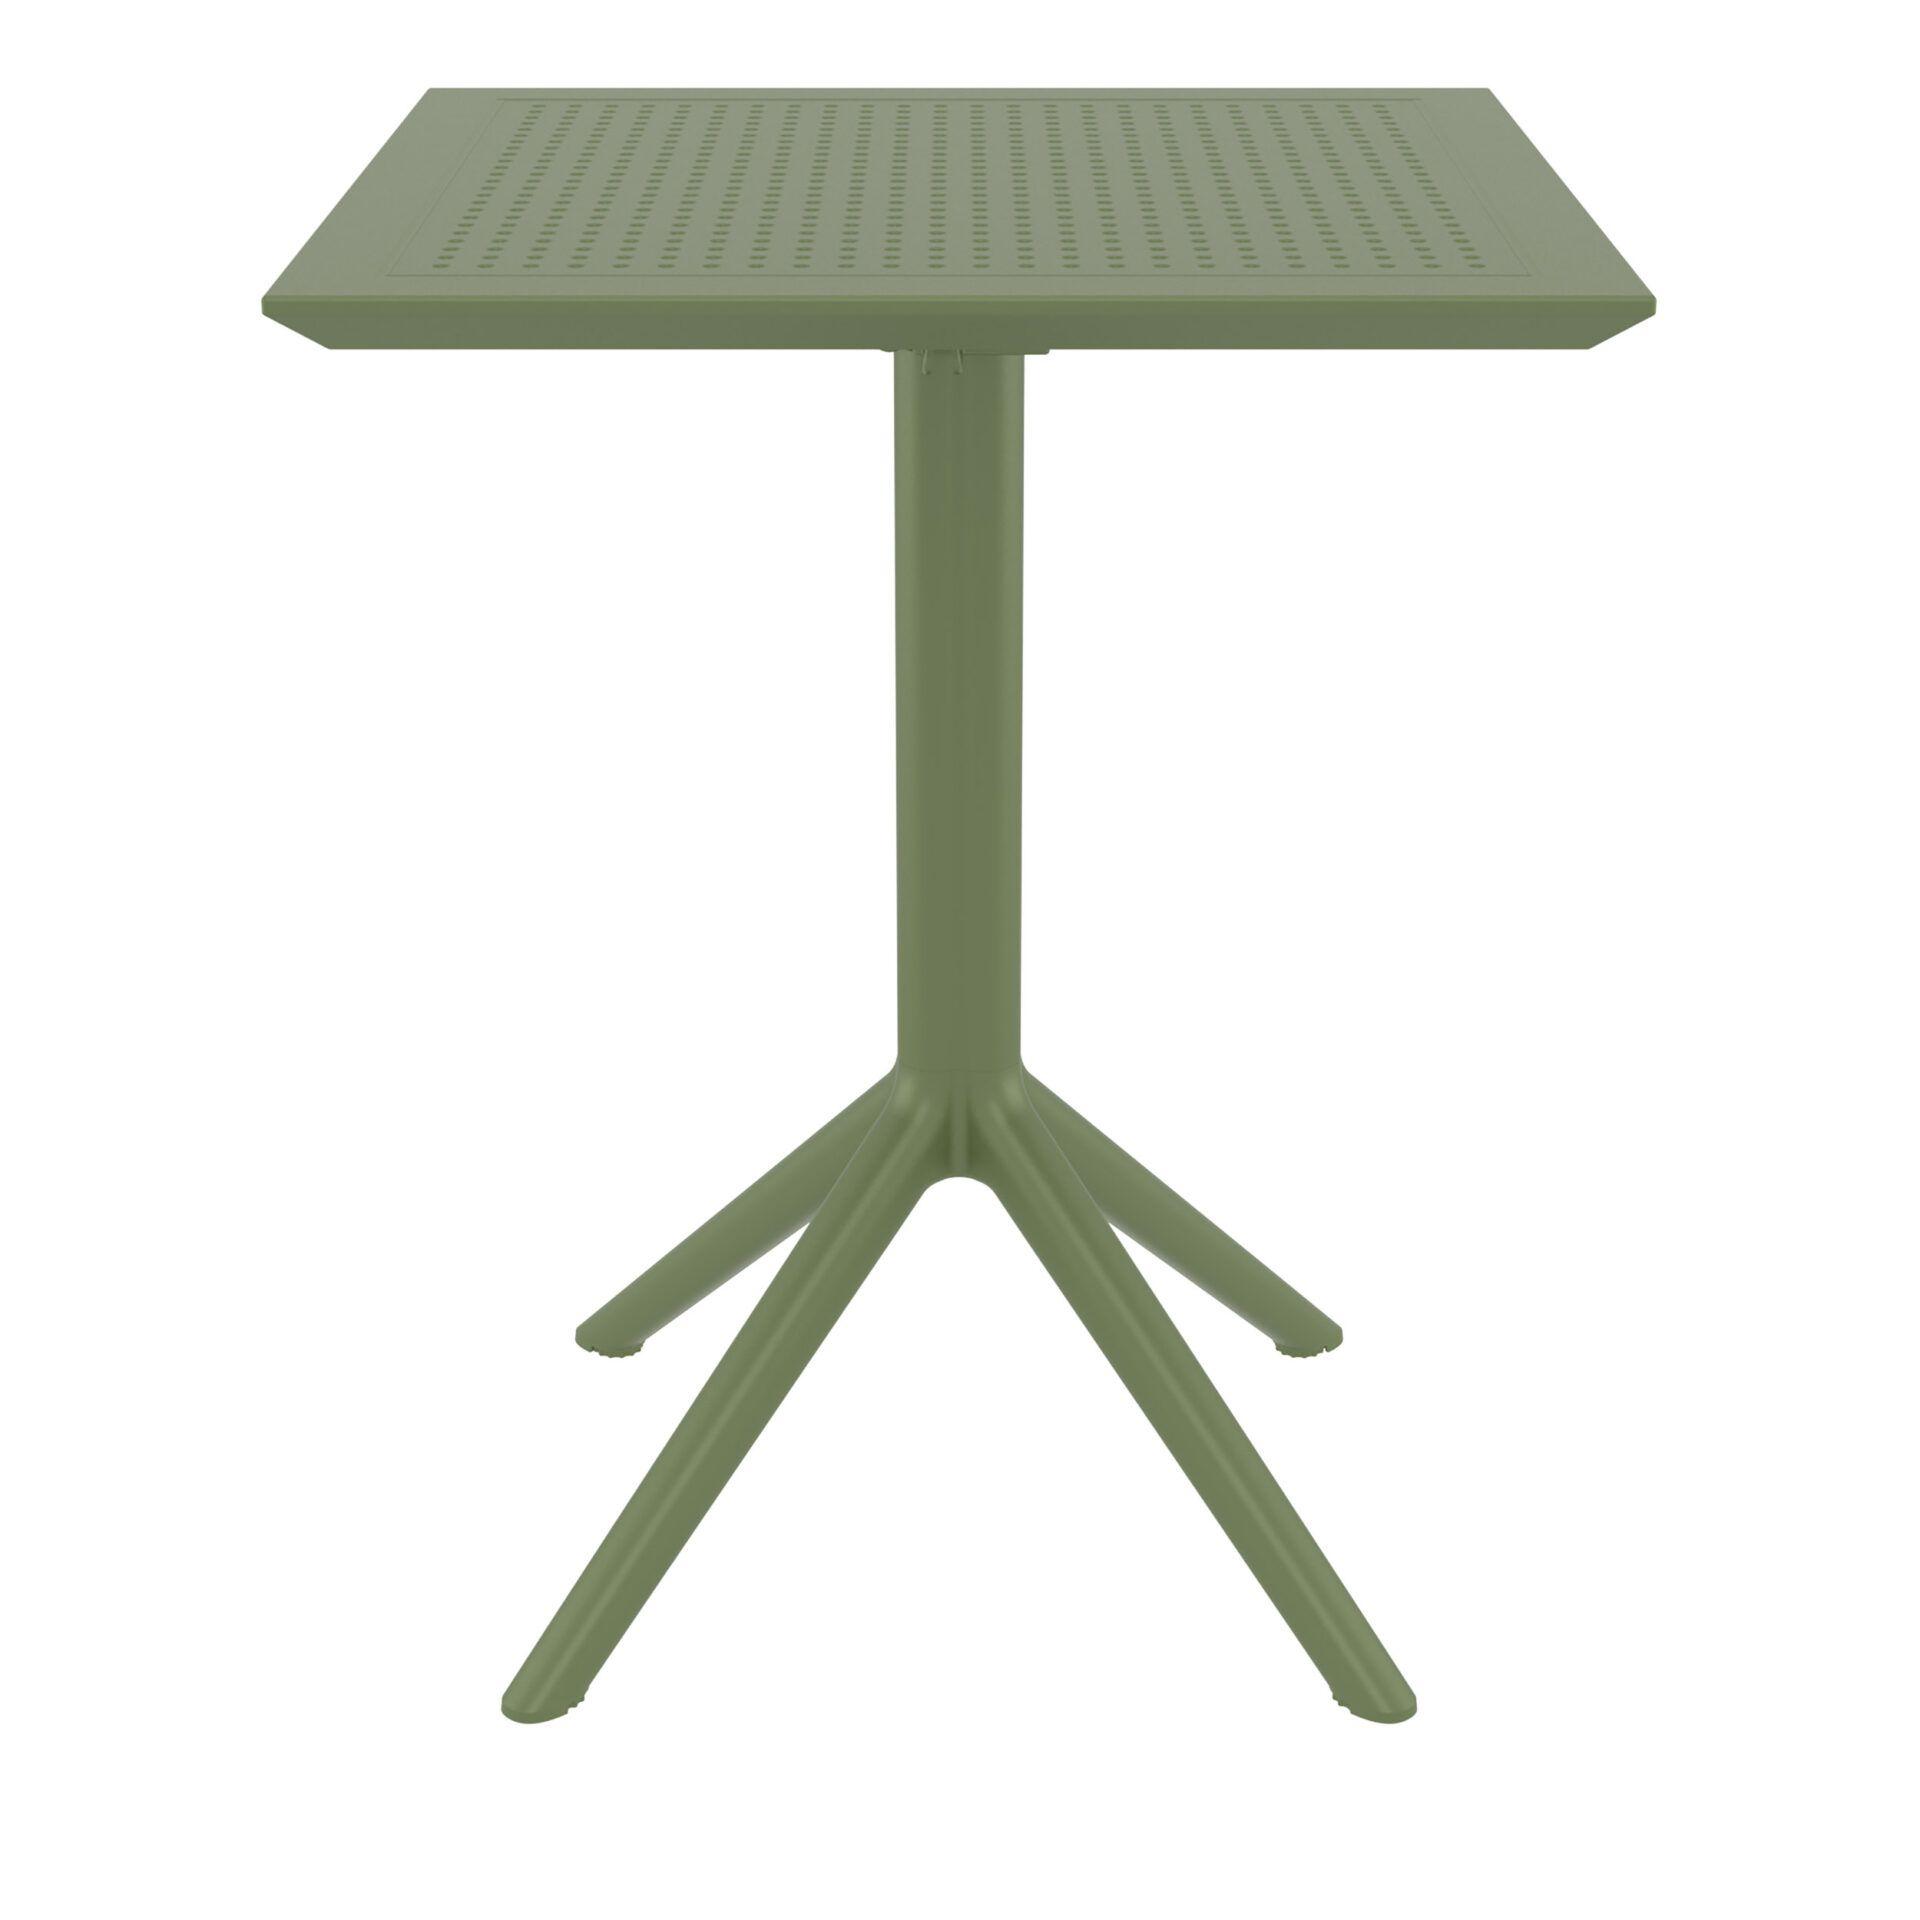 polypropylene outdoor sky folding bar table 60 olive green front